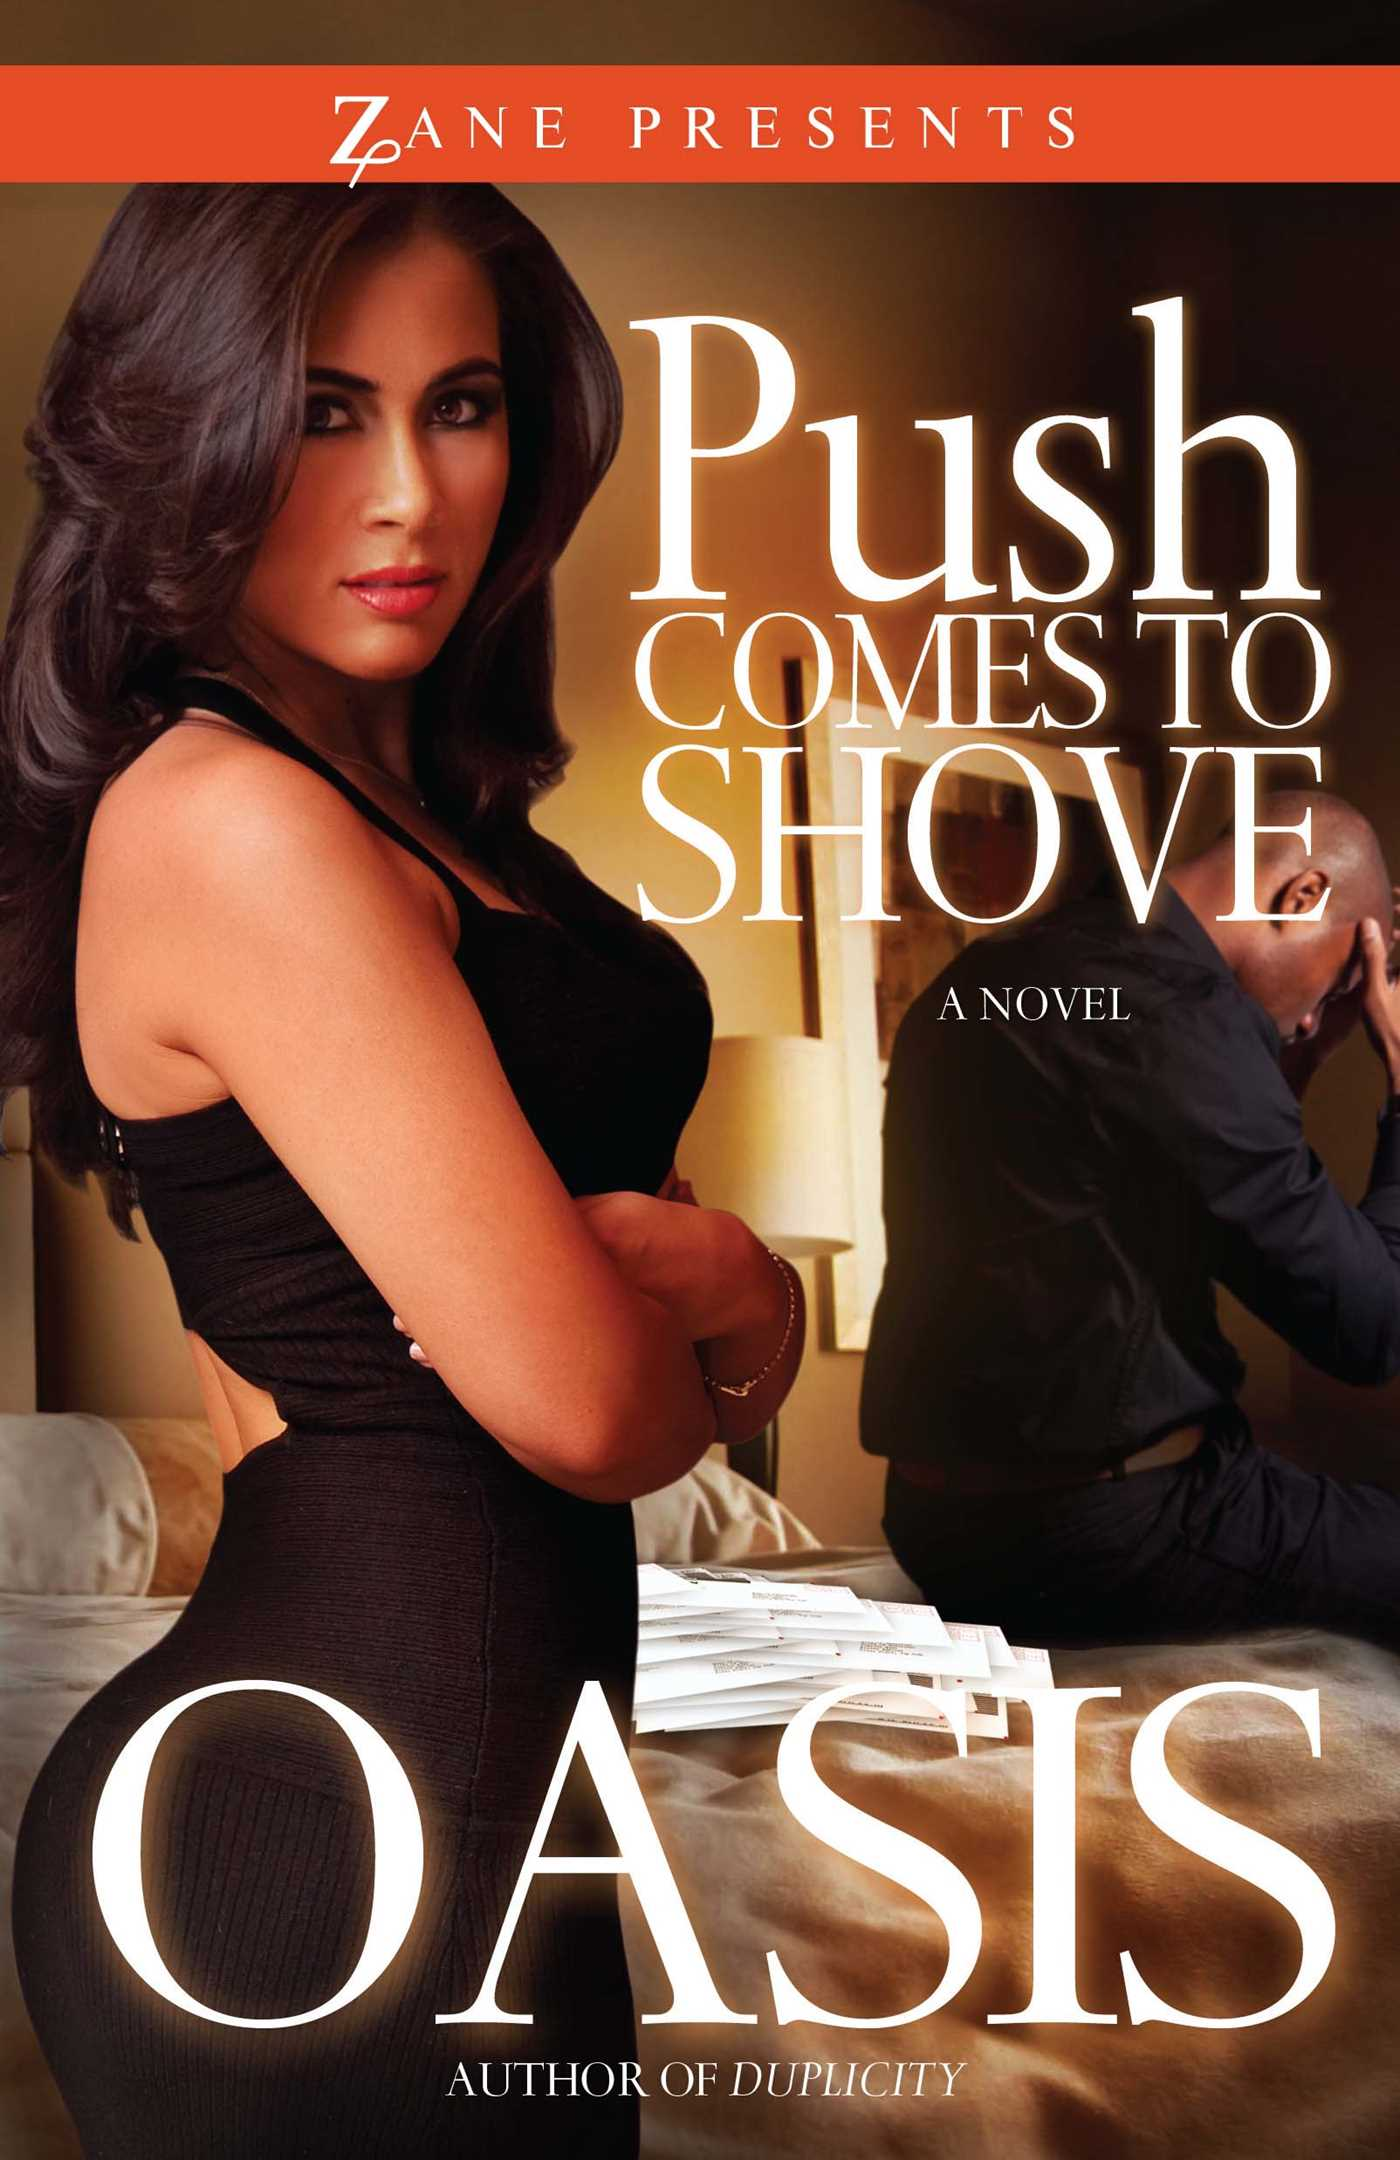 Push comes to shove 9781593092993 hr